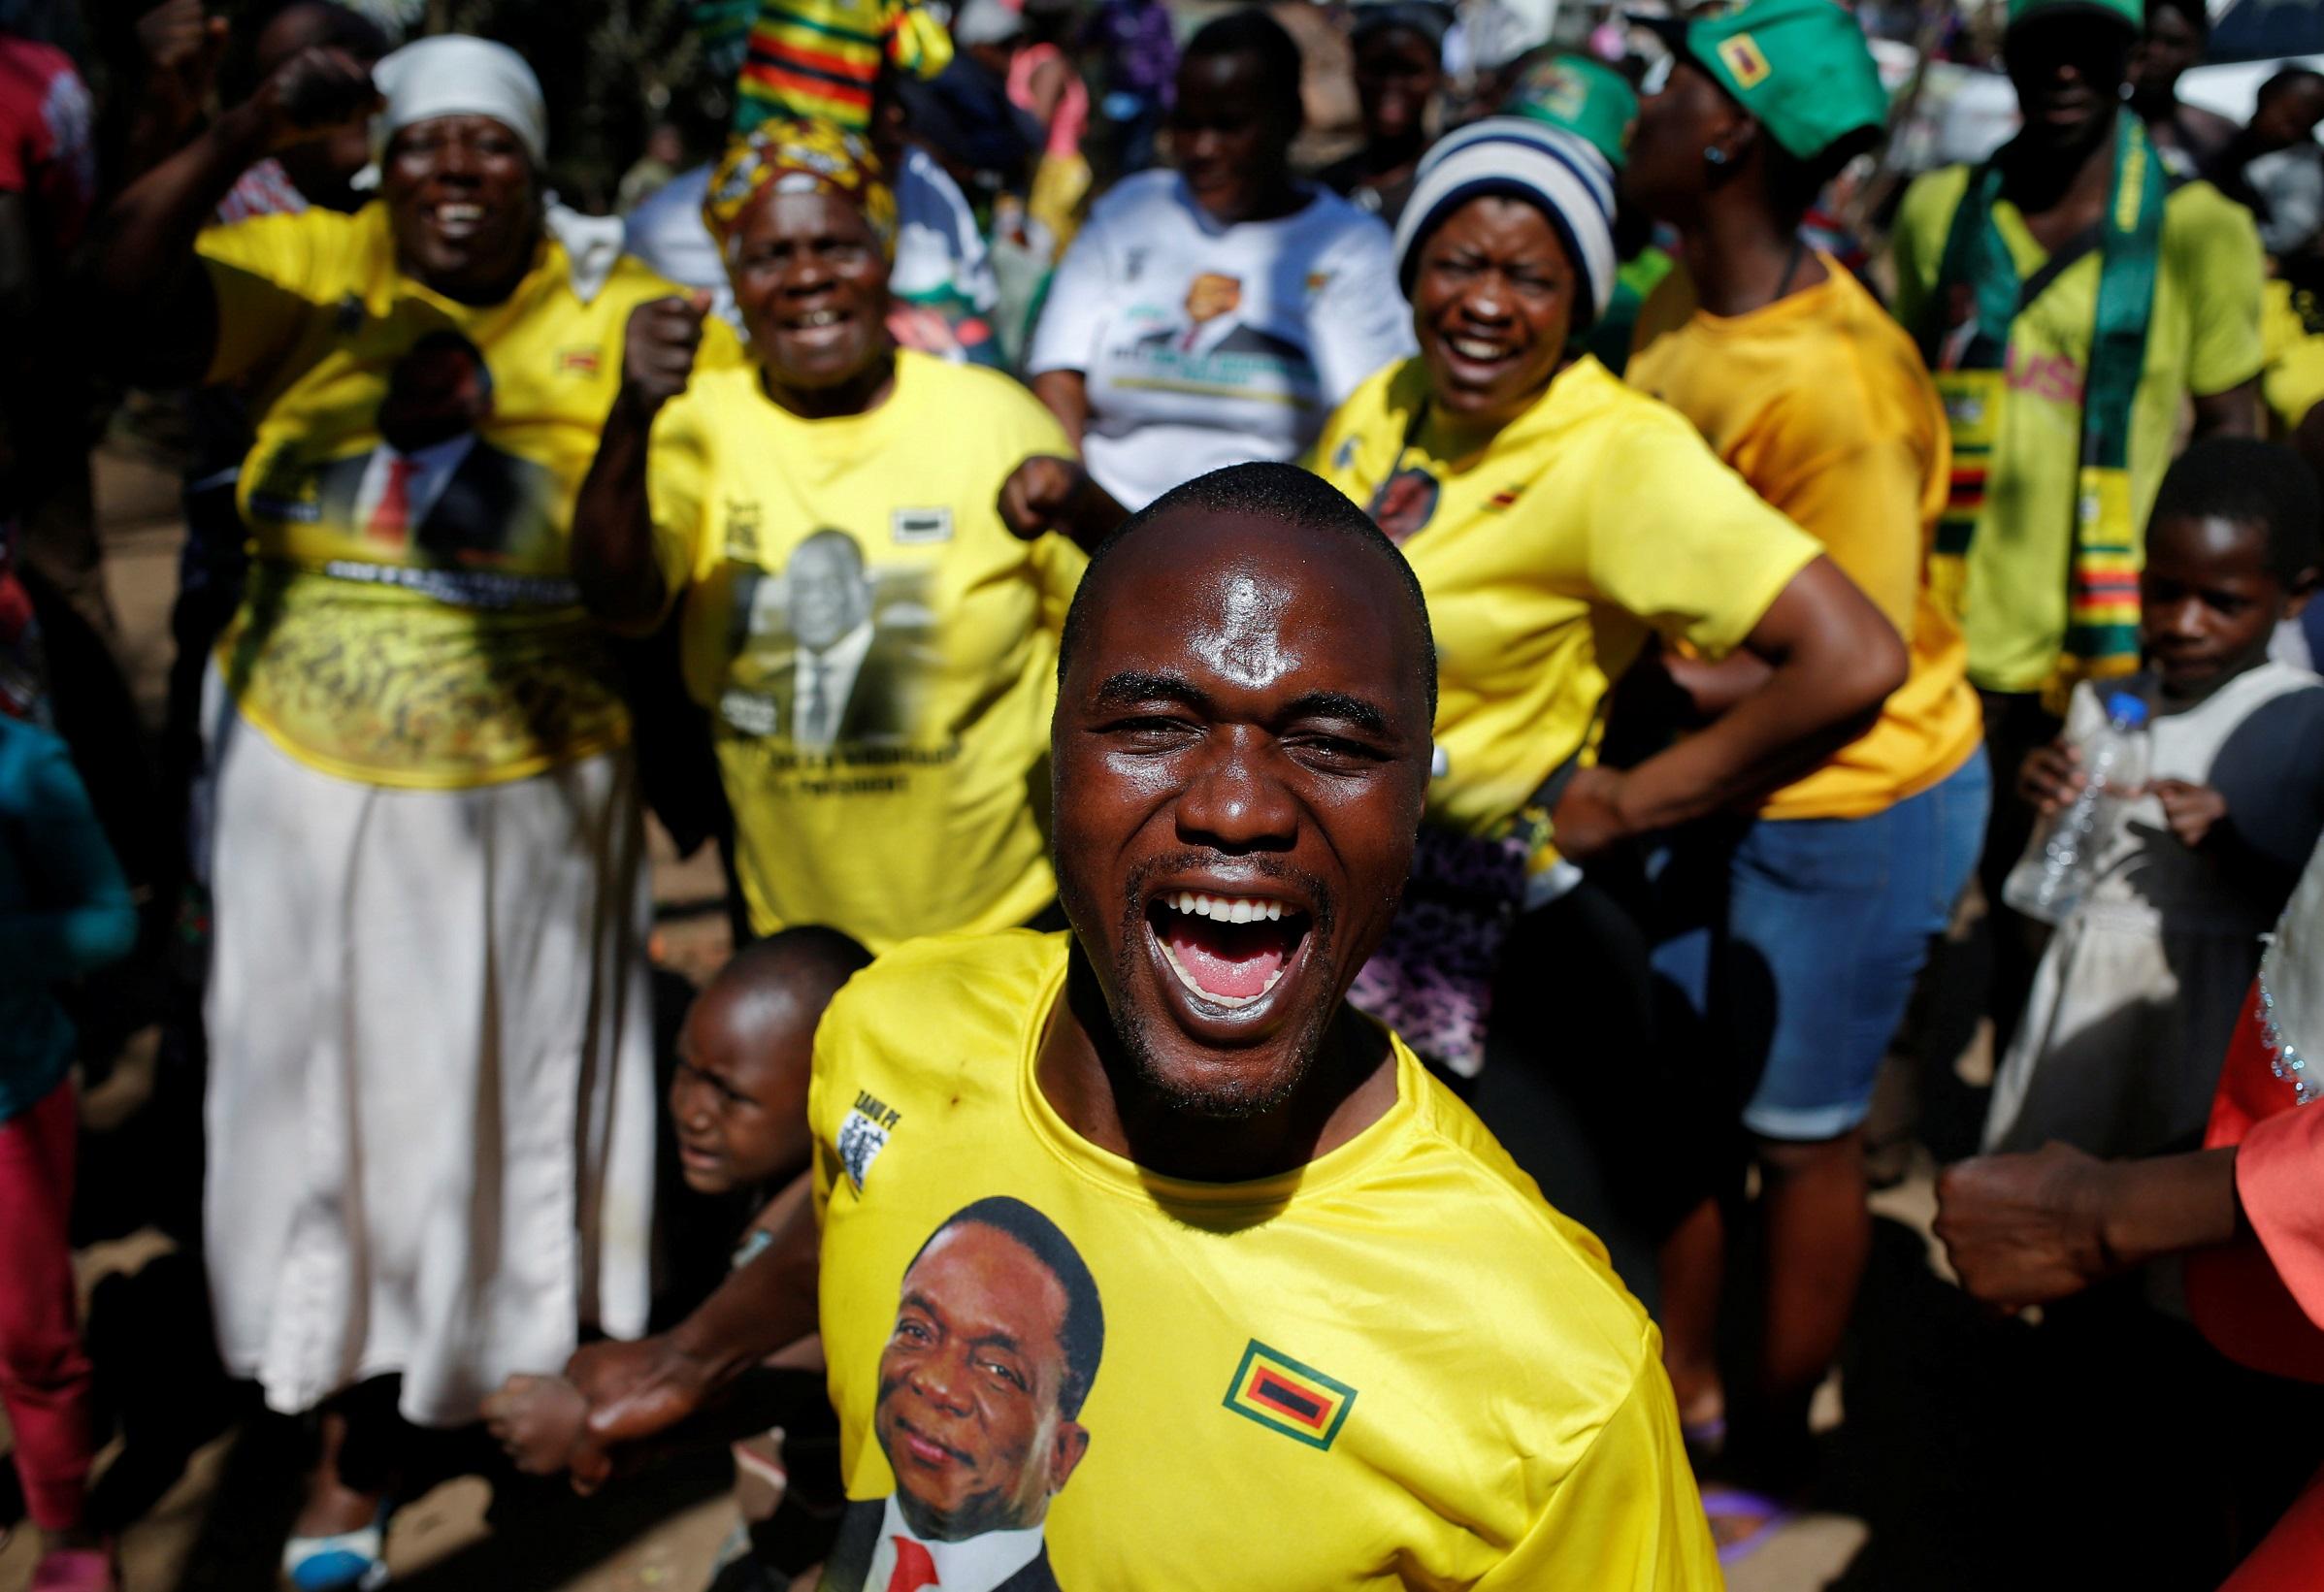 Zimbabwes ruling party ZANU-PF claims majority seats in parliamentary polls